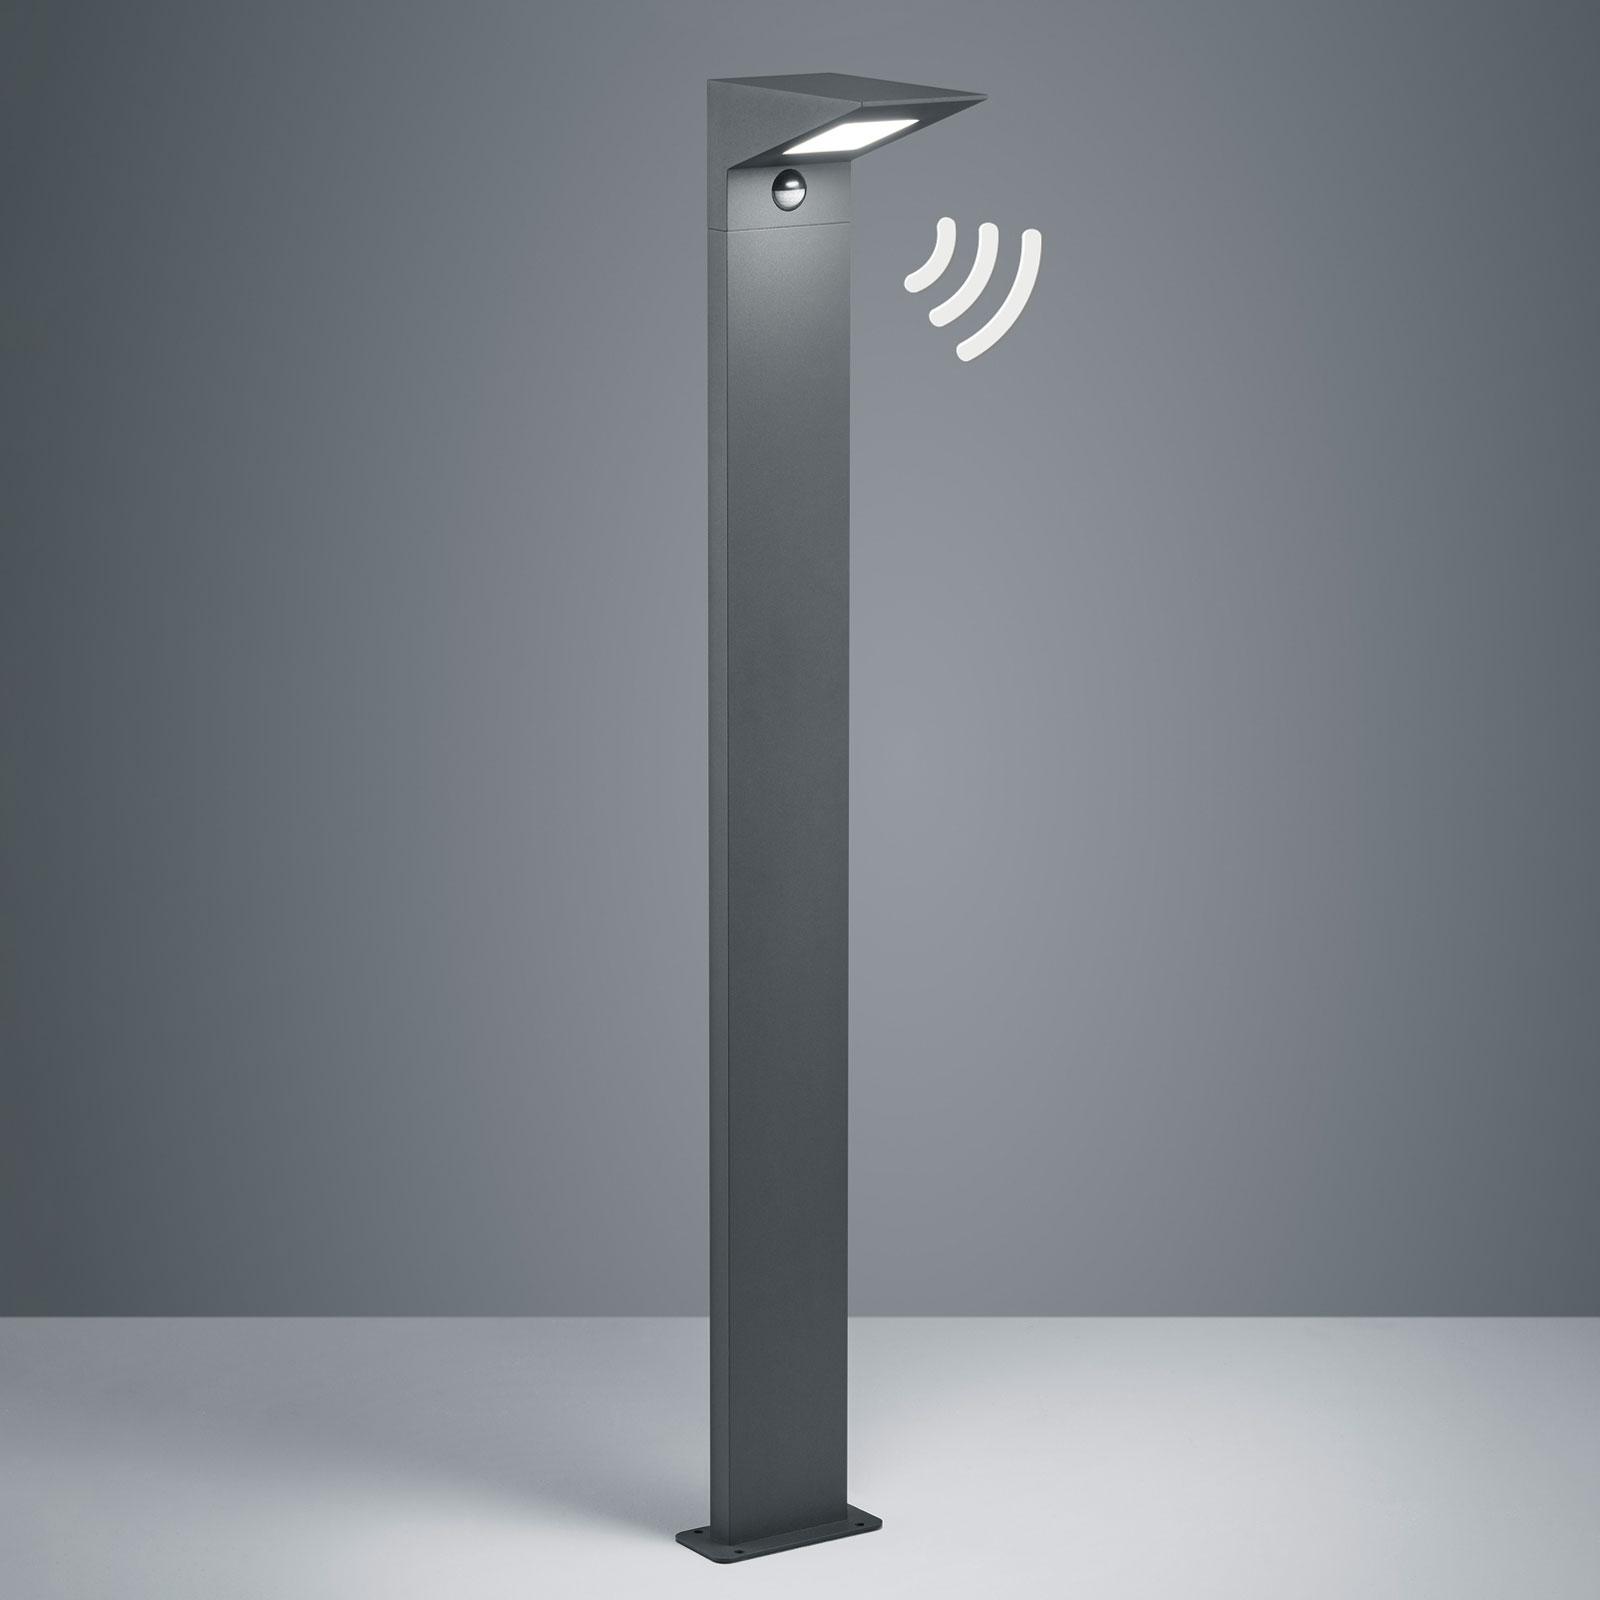 LED-pylväsvalaisin Nelson, 100 cm, tunnistin